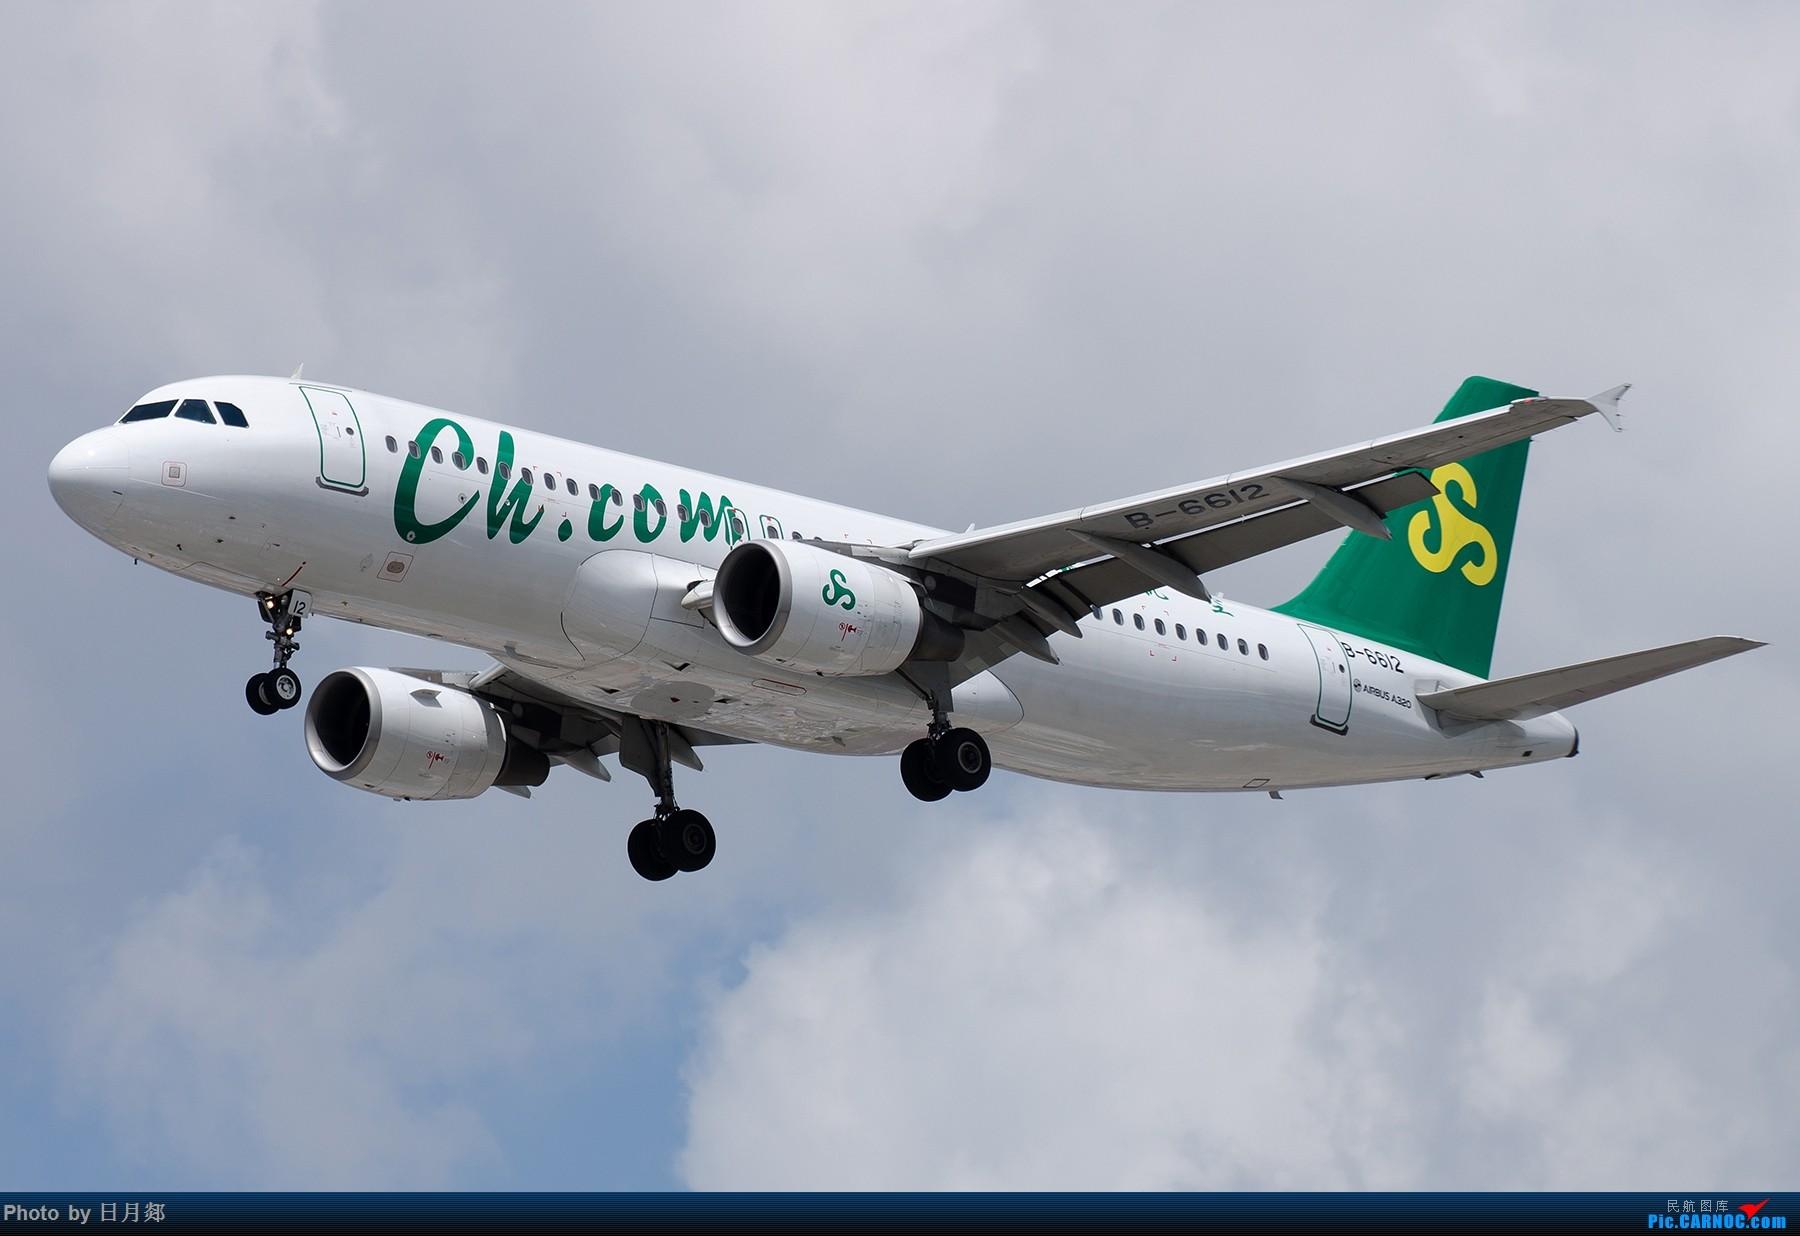 Re:[原创]【SHA拍机*1800大图】图要抓紧发,不然就要炒冷饭,大头镇贴 AIRBUS A320-200 B-6612 中国上海虹桥国际机场